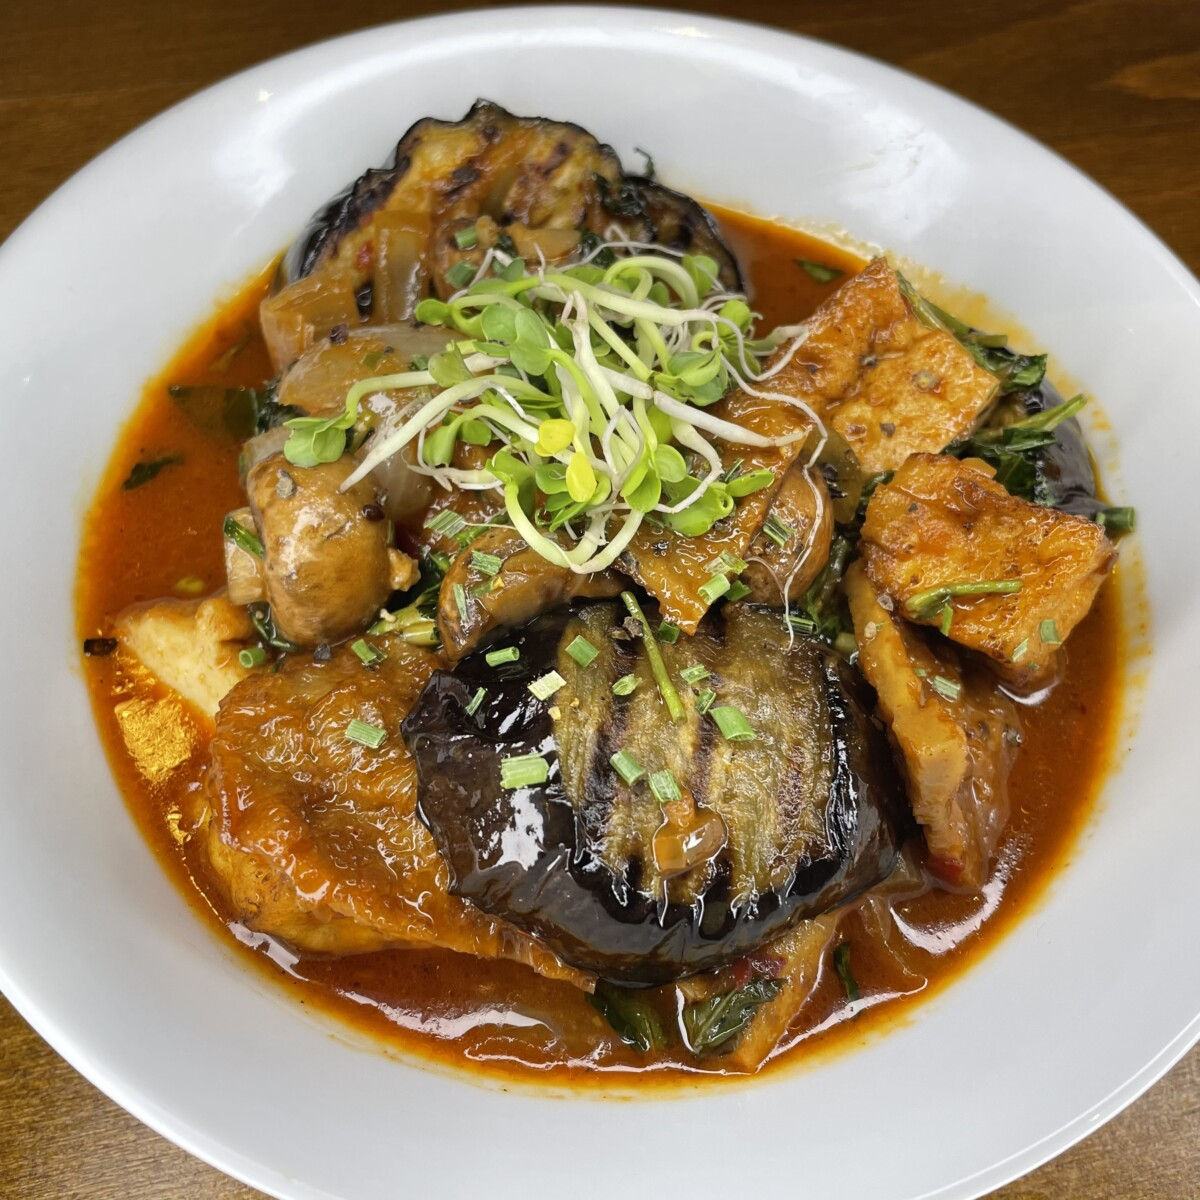 30 Eggplant in Wok (Fry, Wok, Grill)